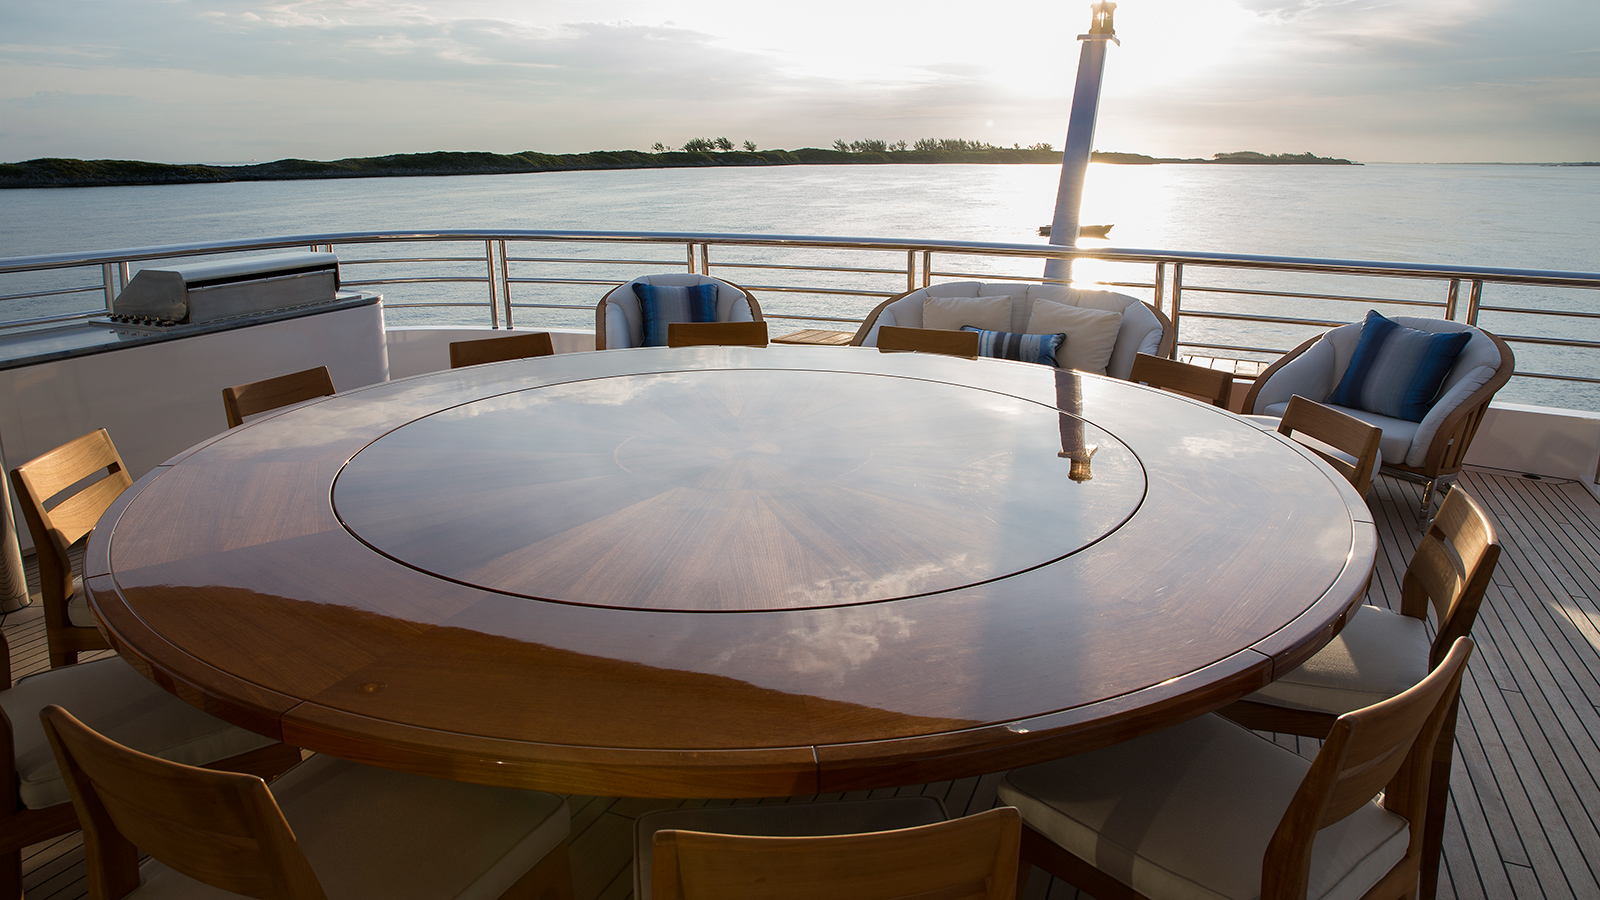 aft-deck-of-hakvoort-super-yacht-just-js